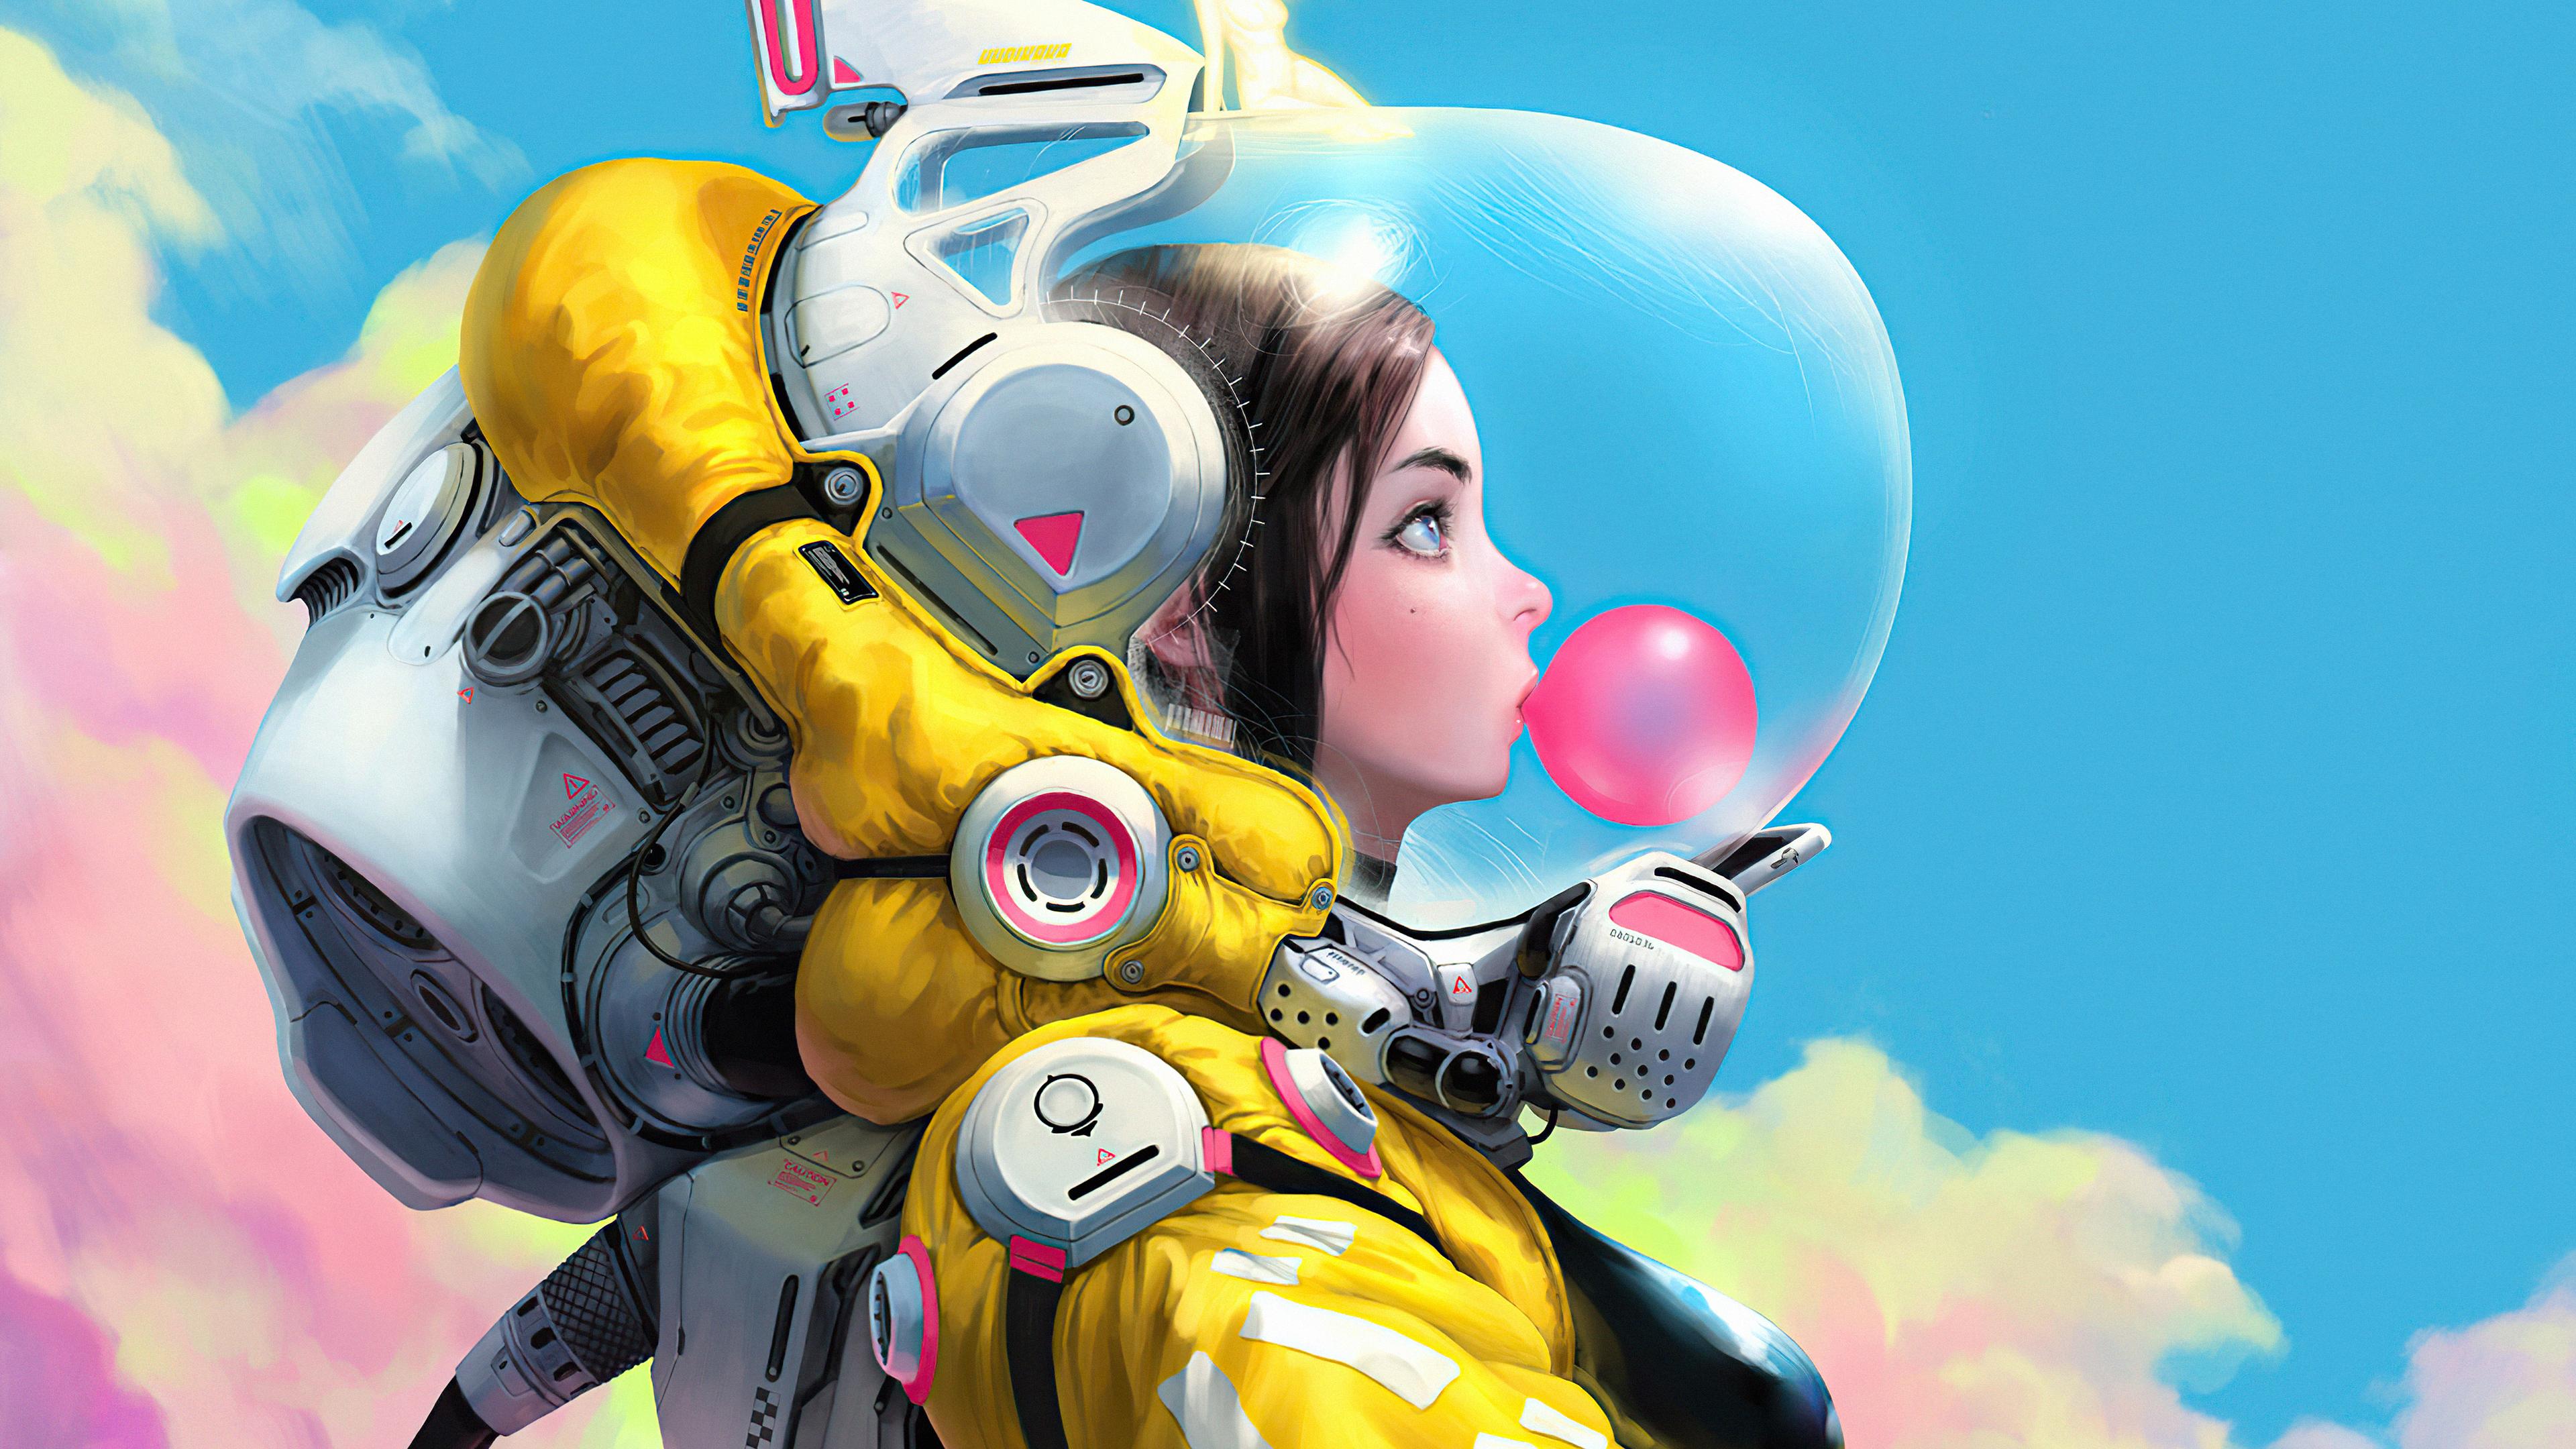 bubblegum space girl 4k 1614624754 - Bubblegum Space Girl 4k - Bubblegum Space Girl 4k wallpapers